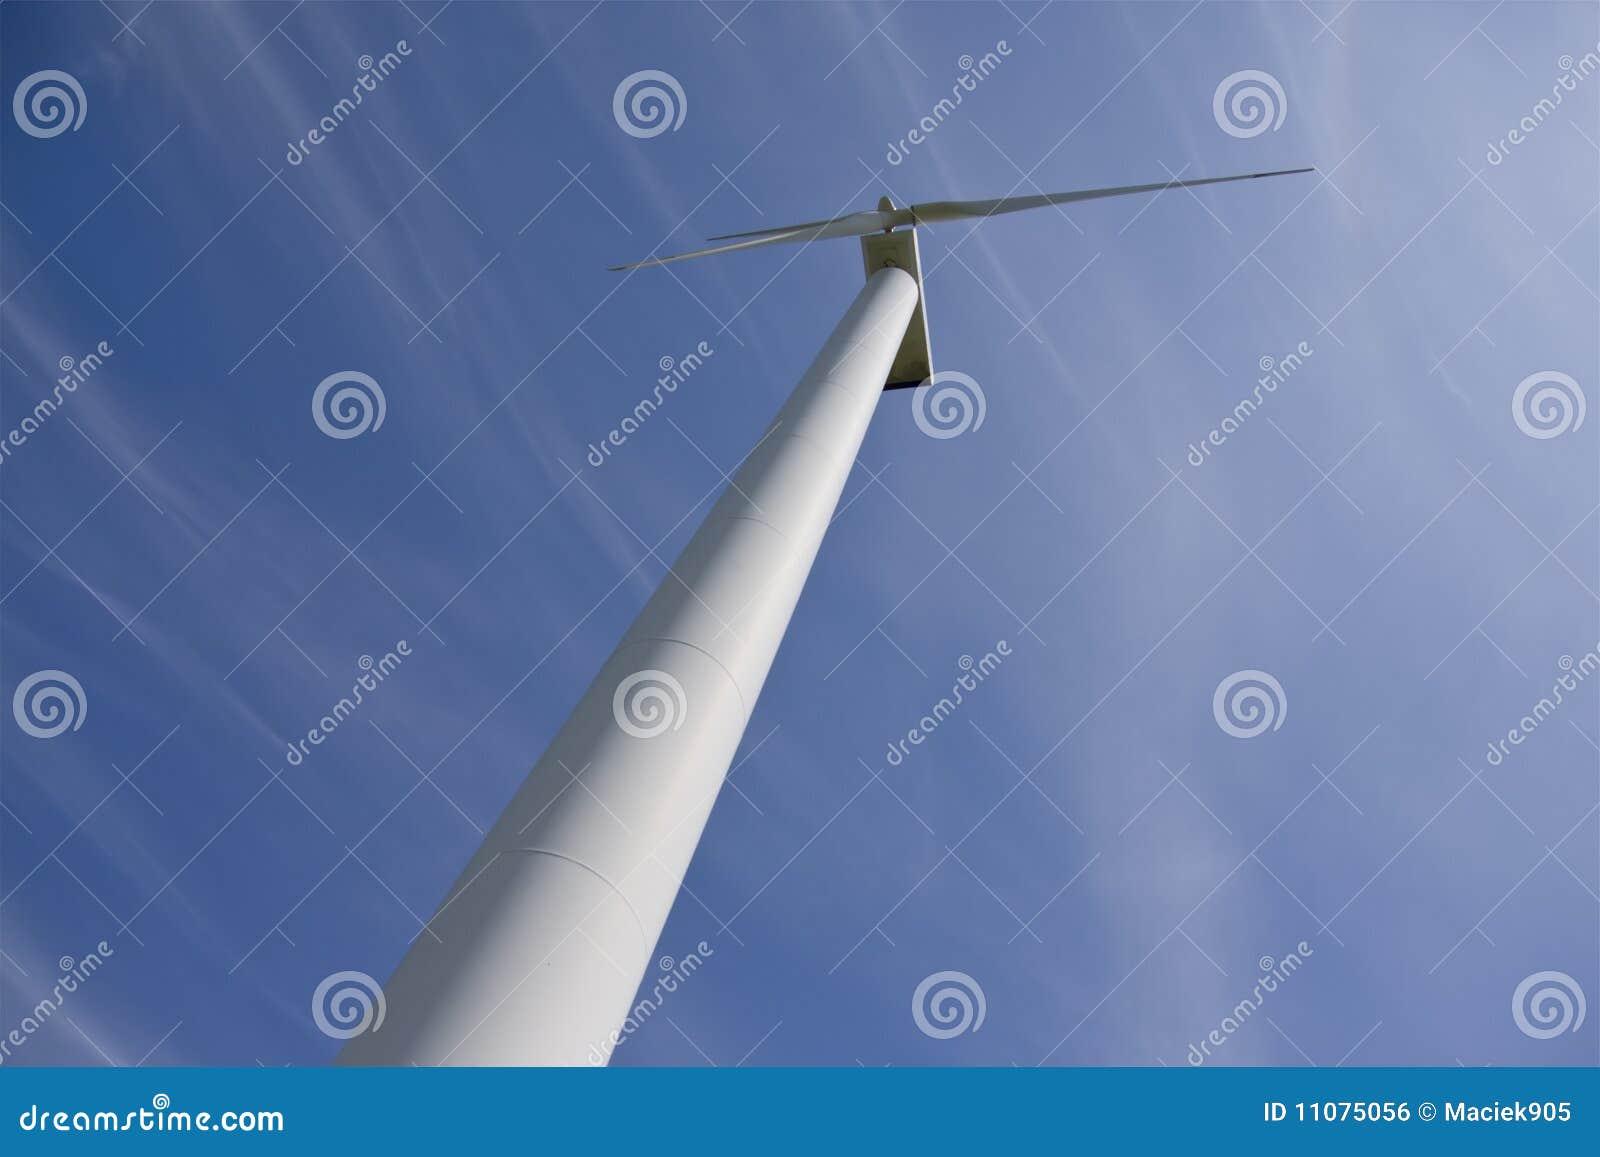 Wind power station against blue sky